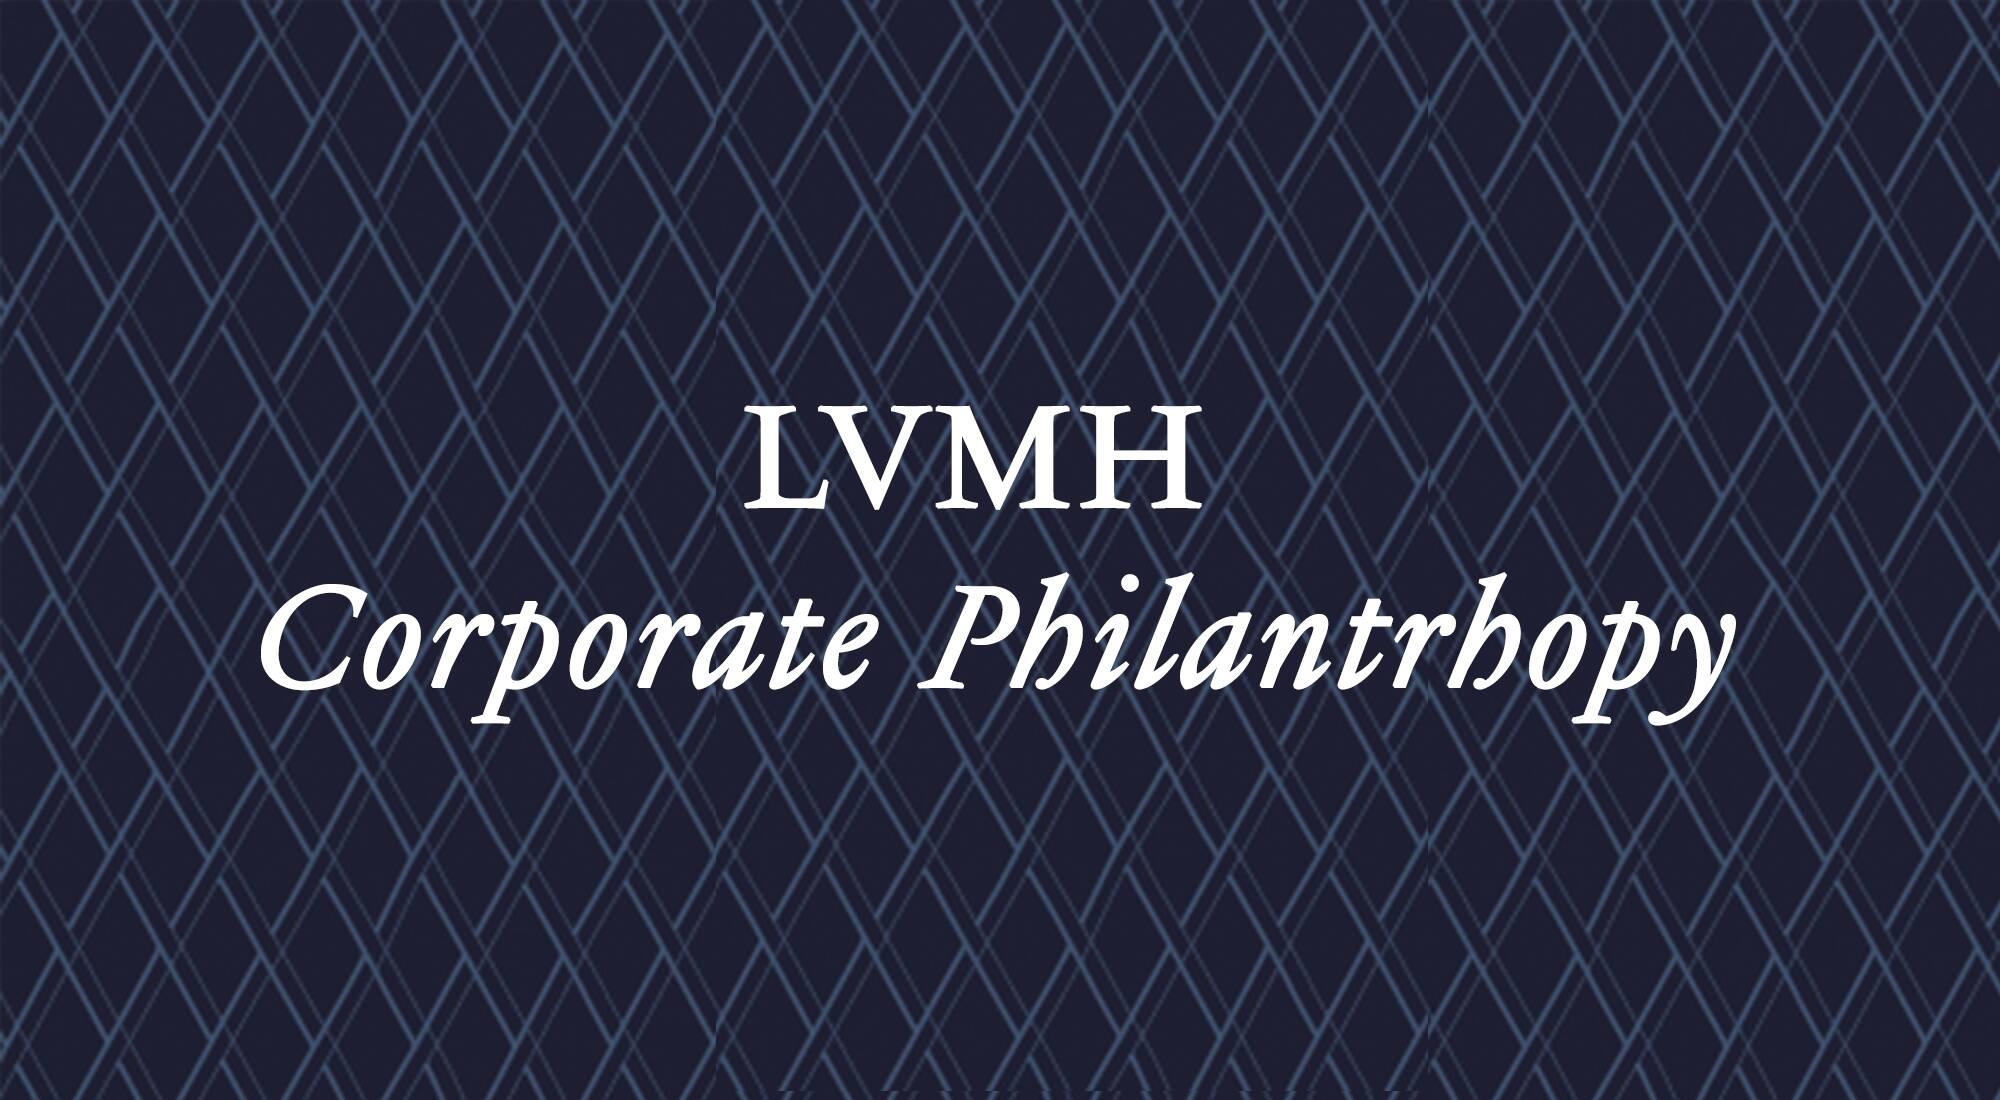 Art Culture Commitment Corporate Philanthropy Lvmh